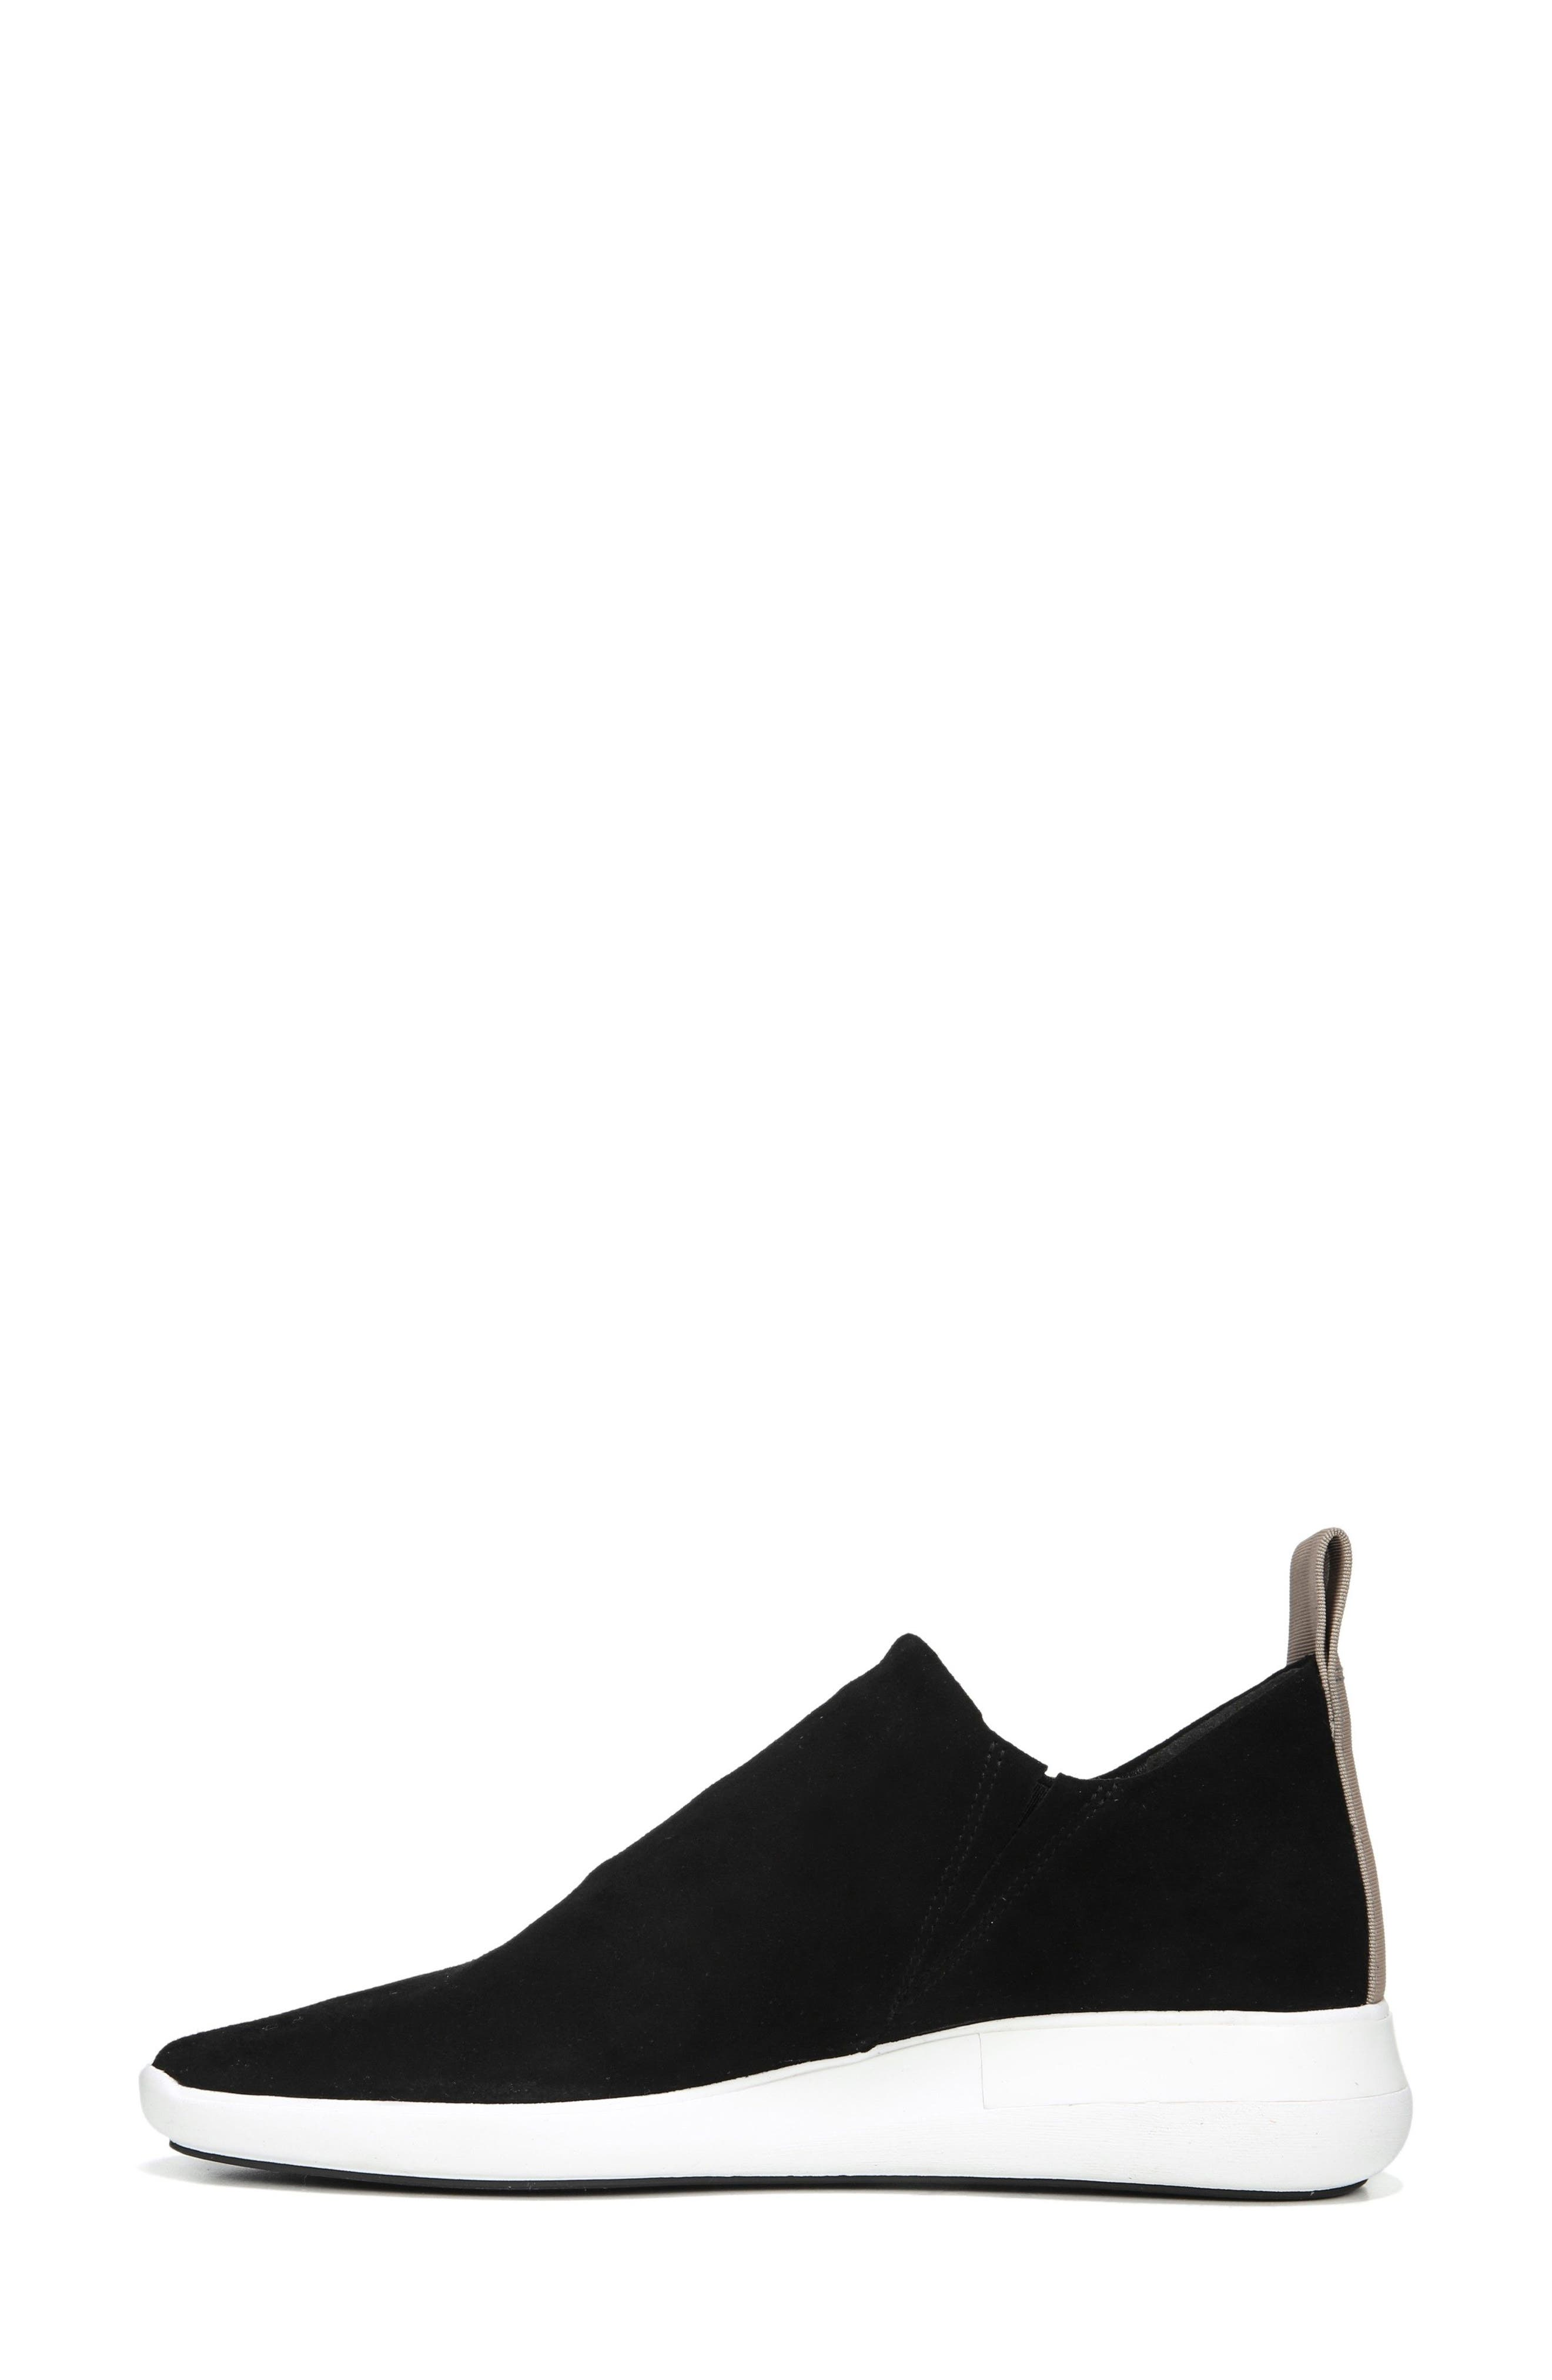 VIA SPIGA, Marlow Slip-On Sneaker, Alternate thumbnail 3, color, BLACK SUEDE